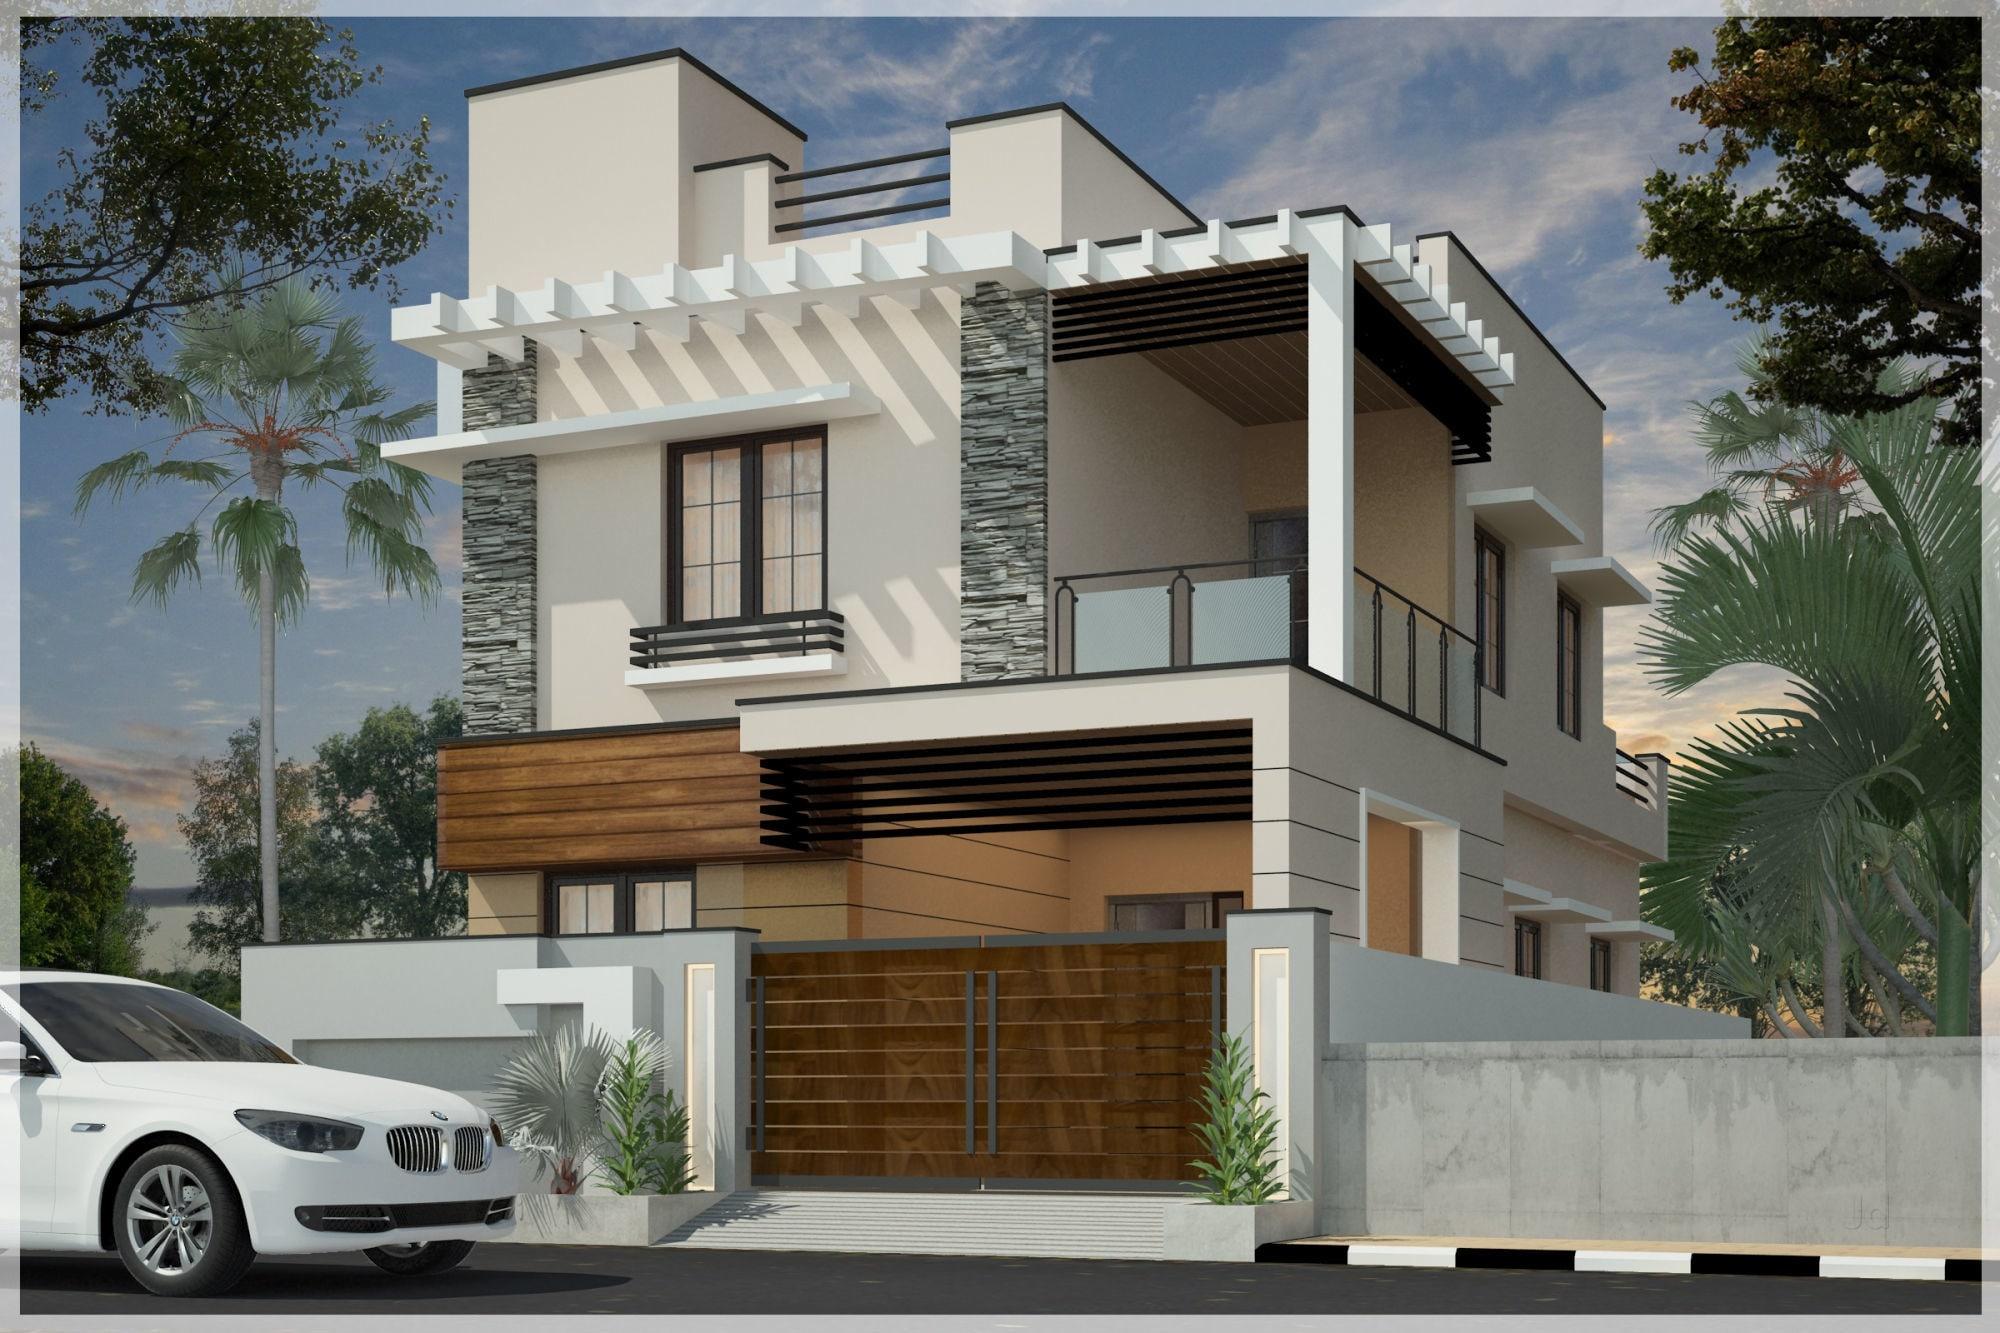 Top 50 Plan Approval Cmda in Ambattur, Chennai - Justdial